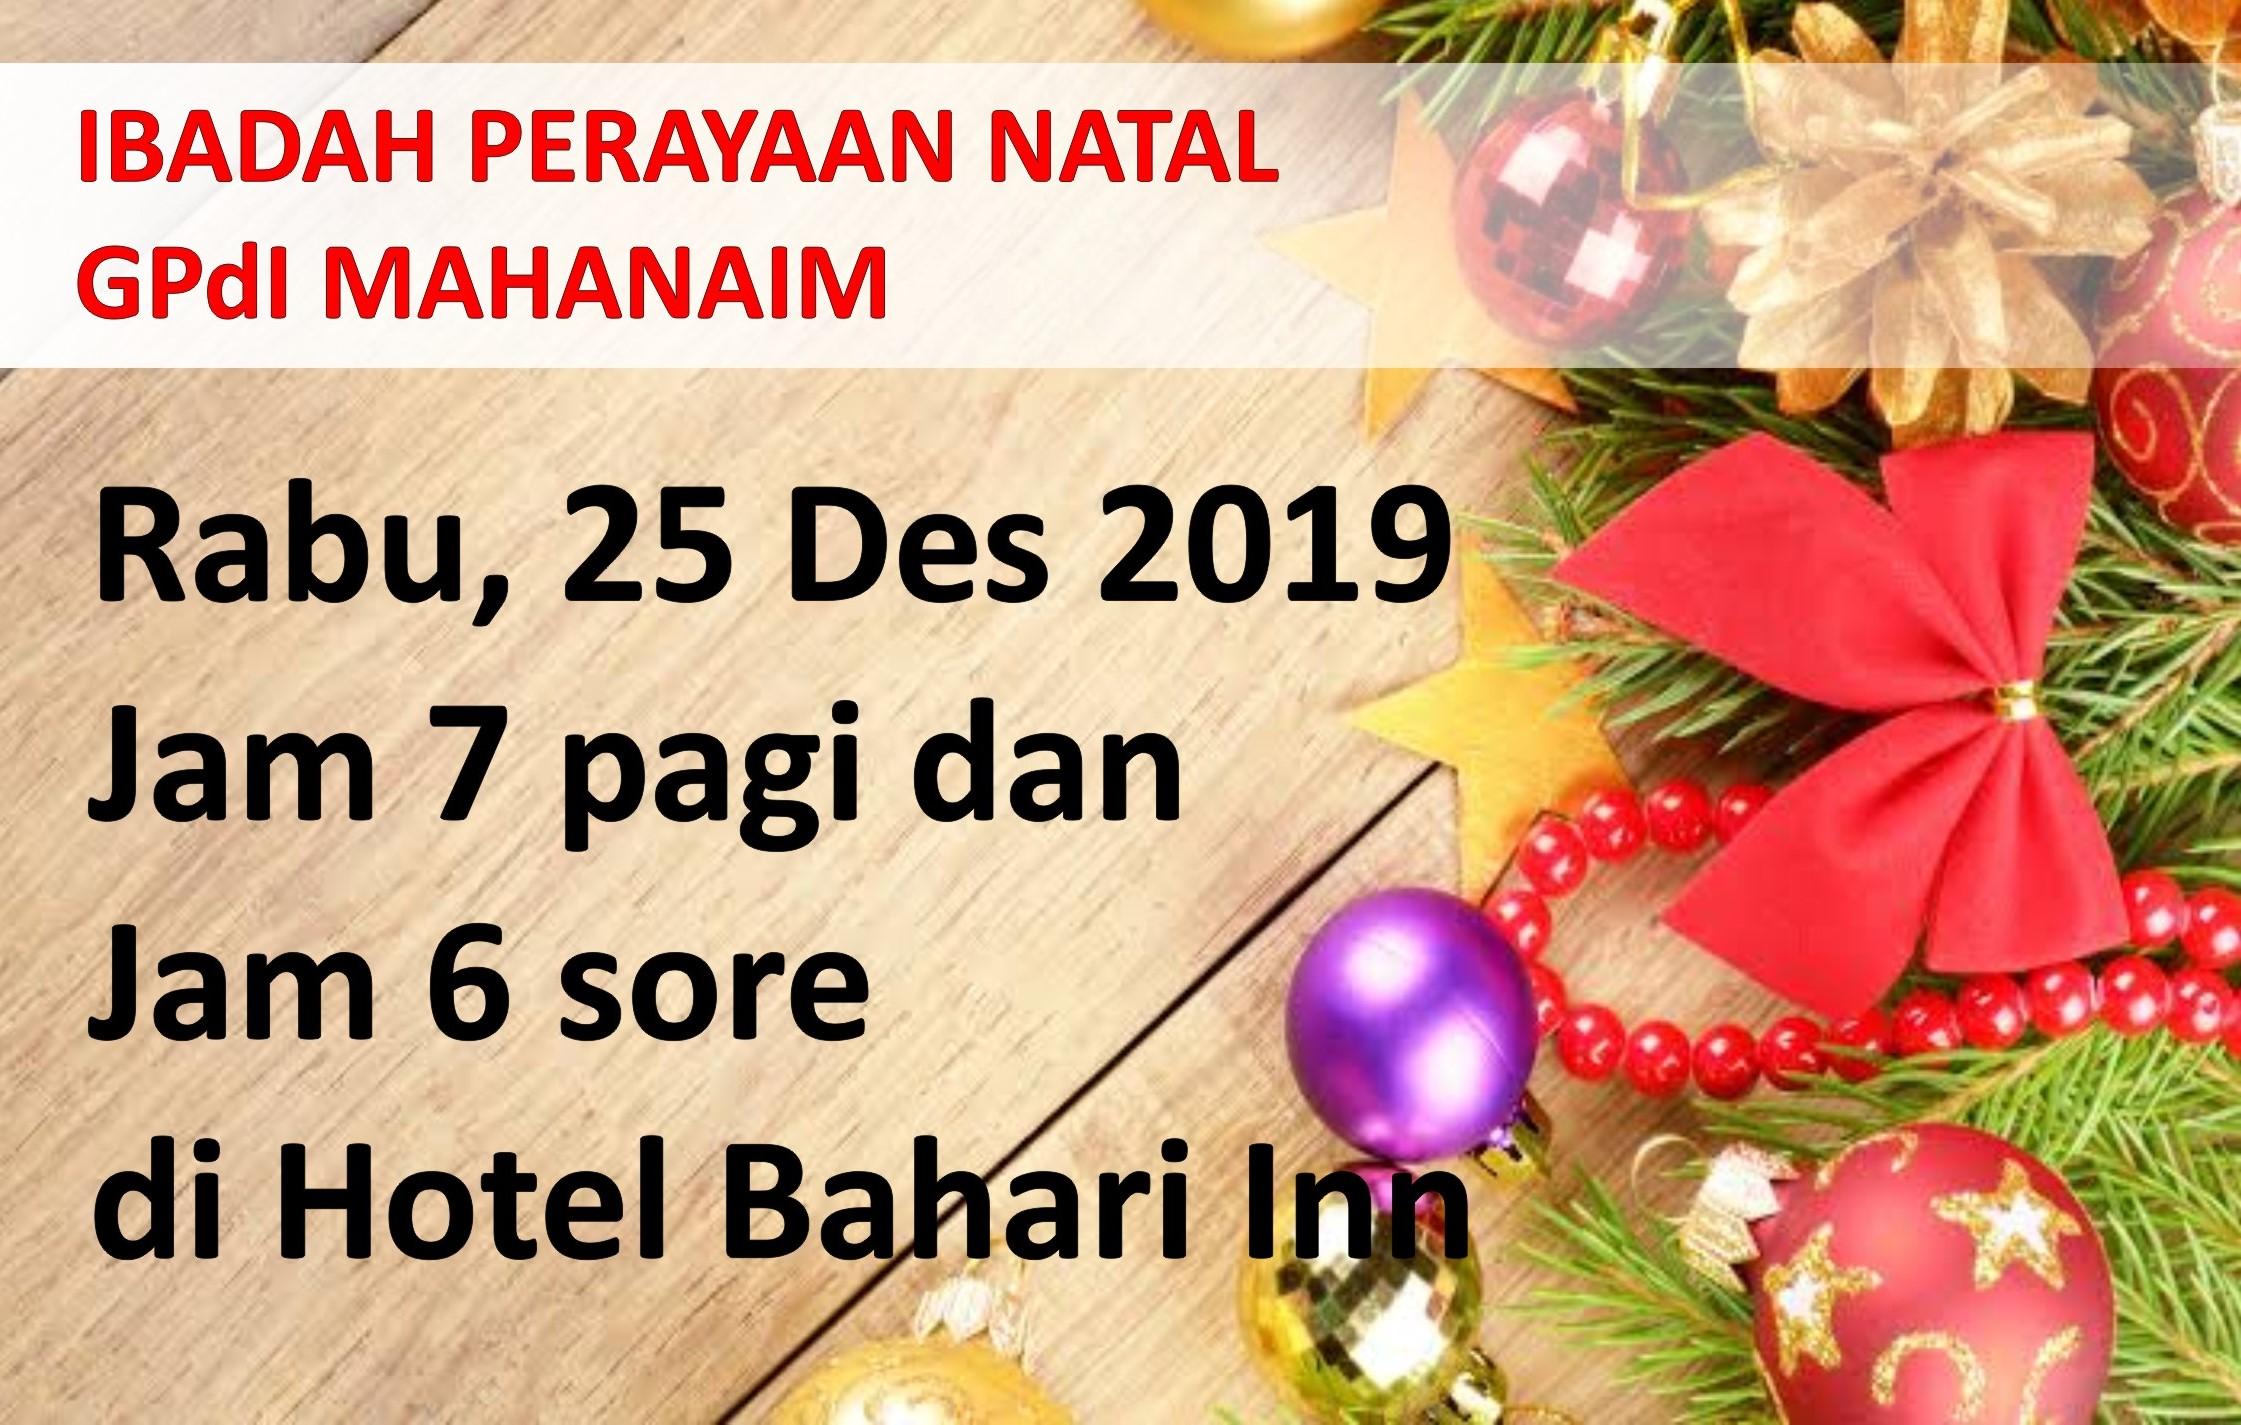 BROSUR PERAYAAN NATAL 2019 (1)